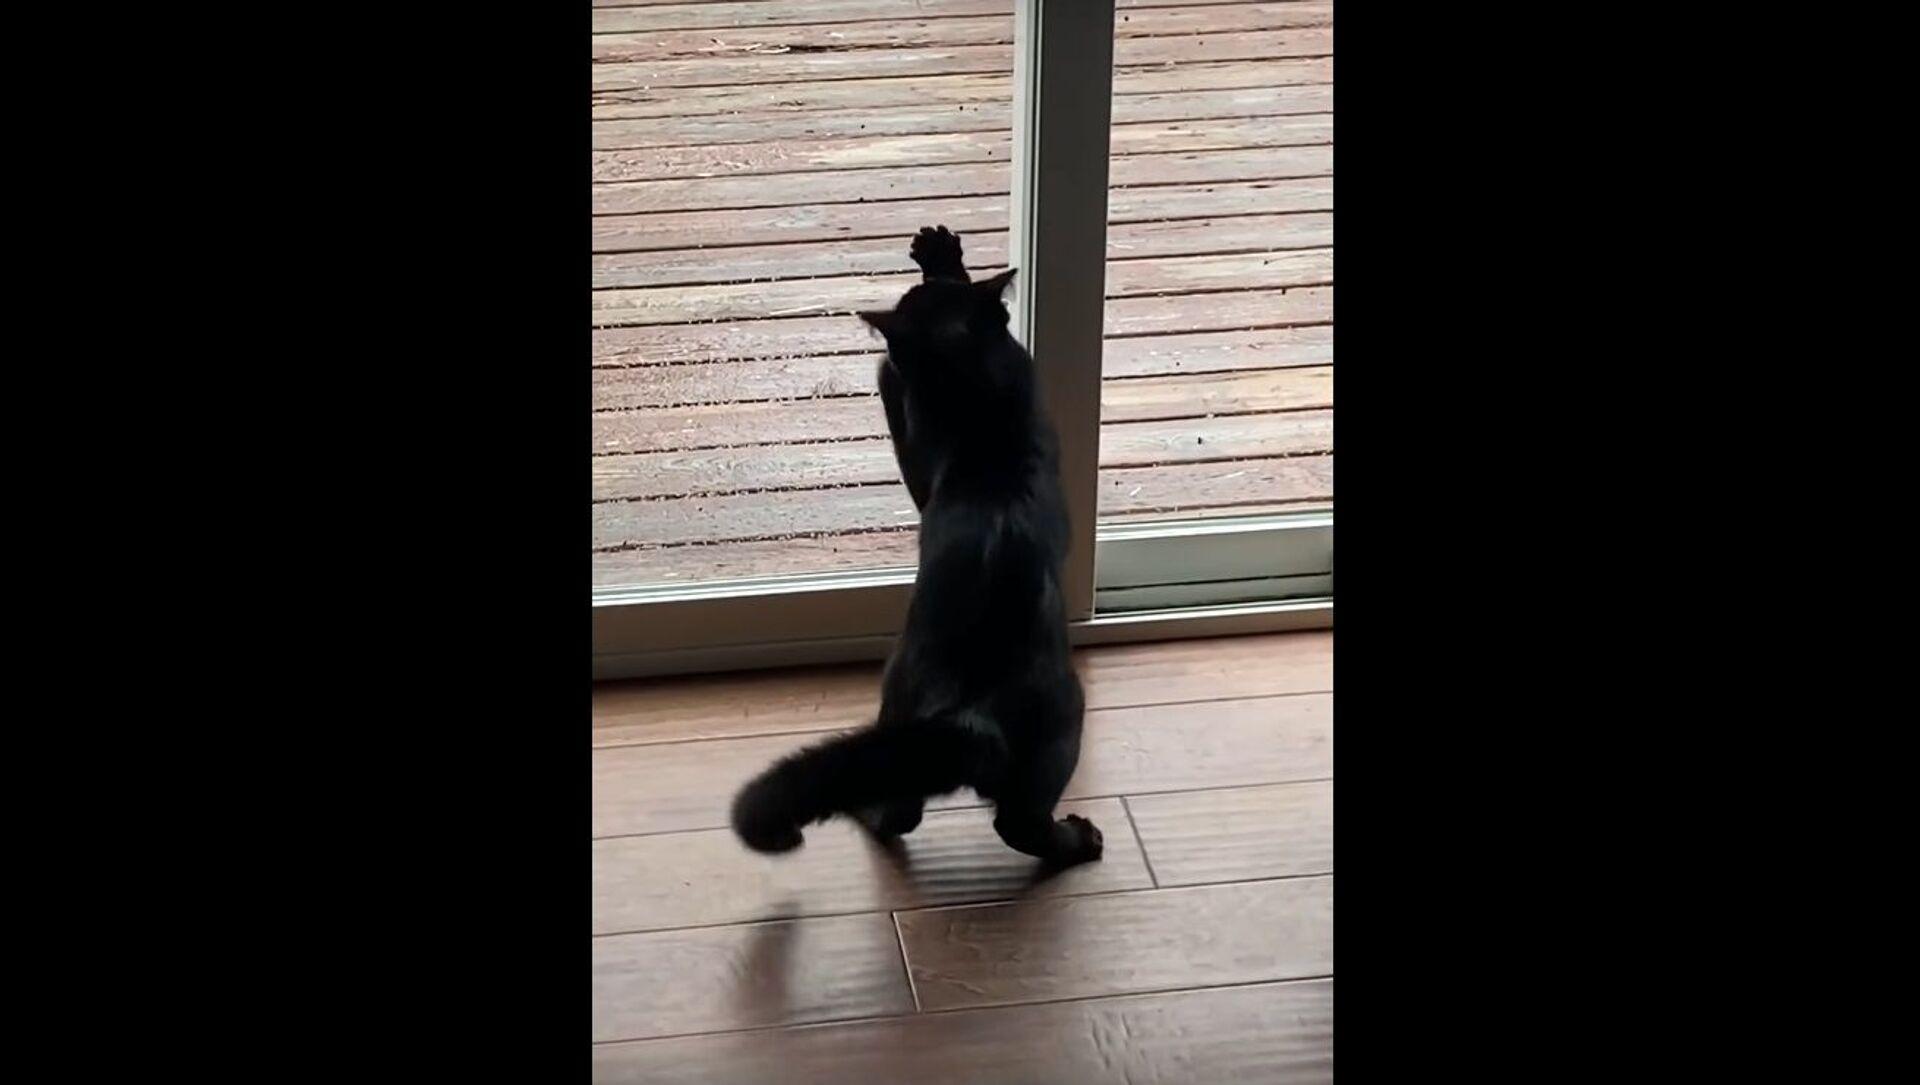 Kitten Doesn't Understand Glass Yet || ViralHog - Sputnik Italia, 1920, 18.03.2021